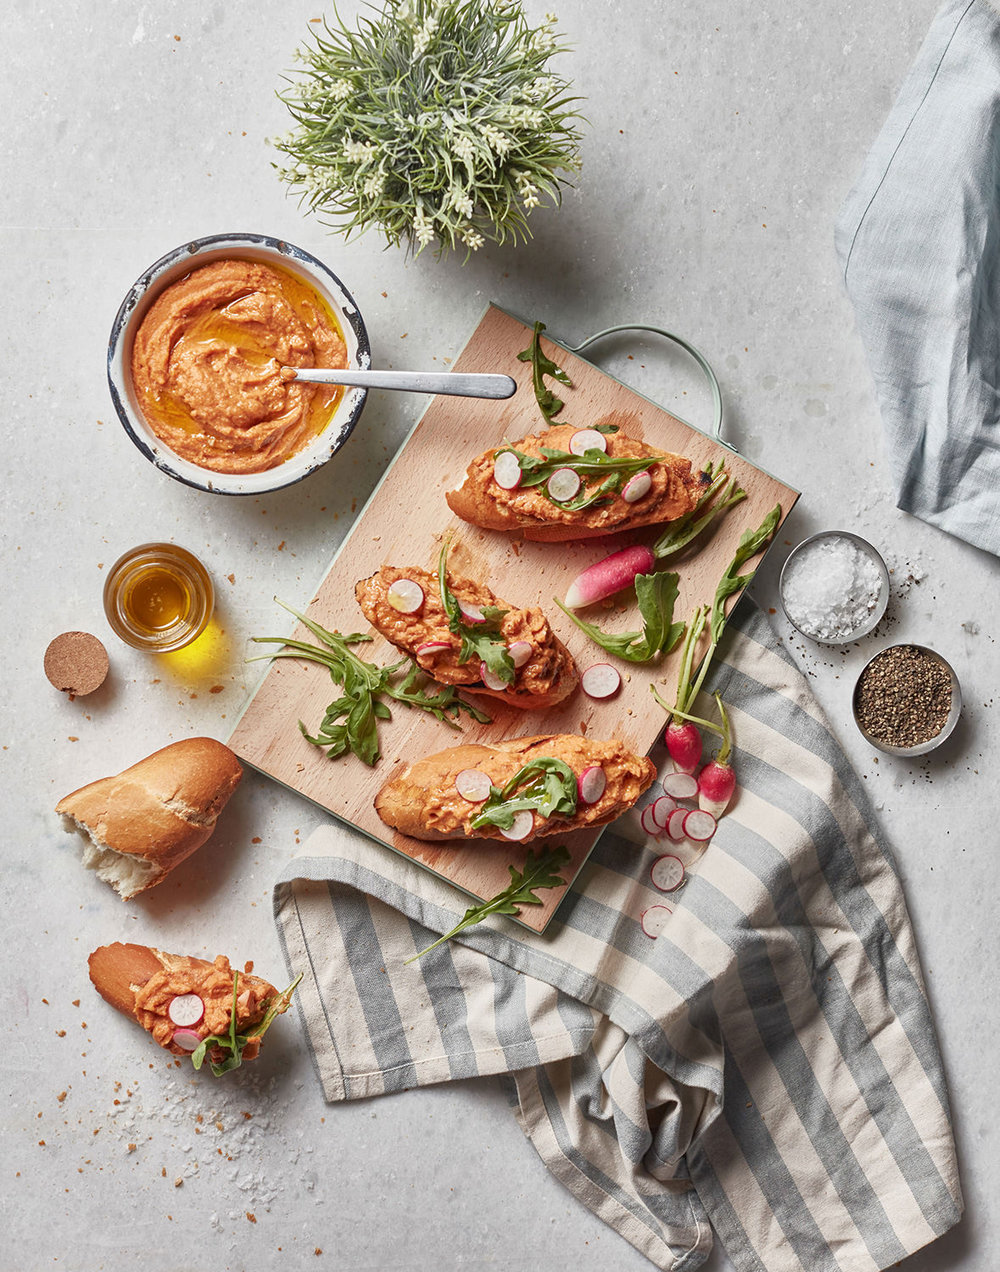 Dubai_Food_Photographer_27.jpg